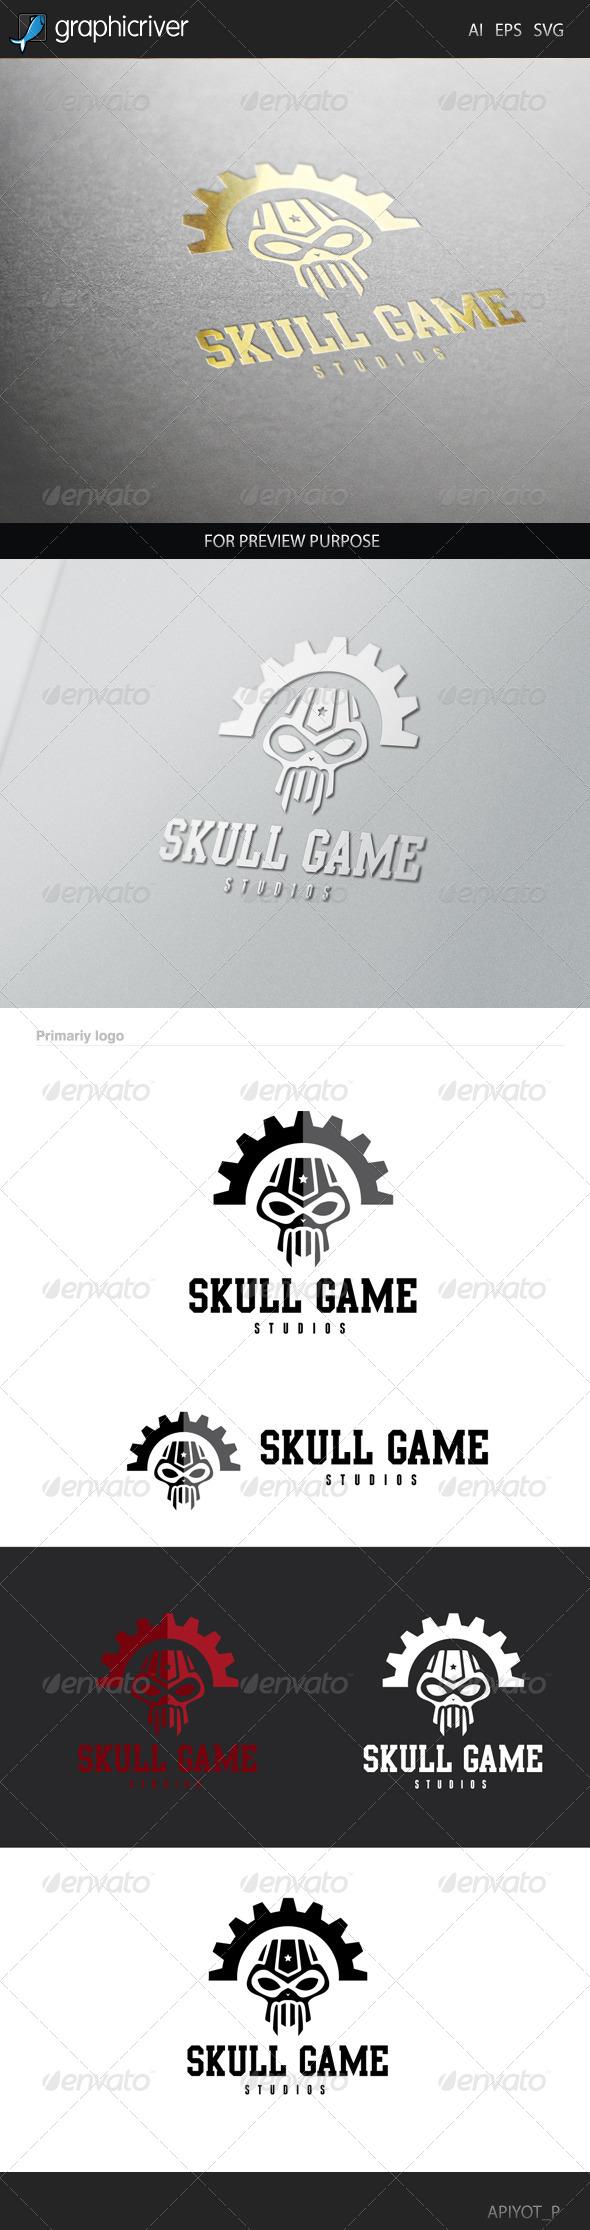 GraphicRiver Skull Game Logo 8505926